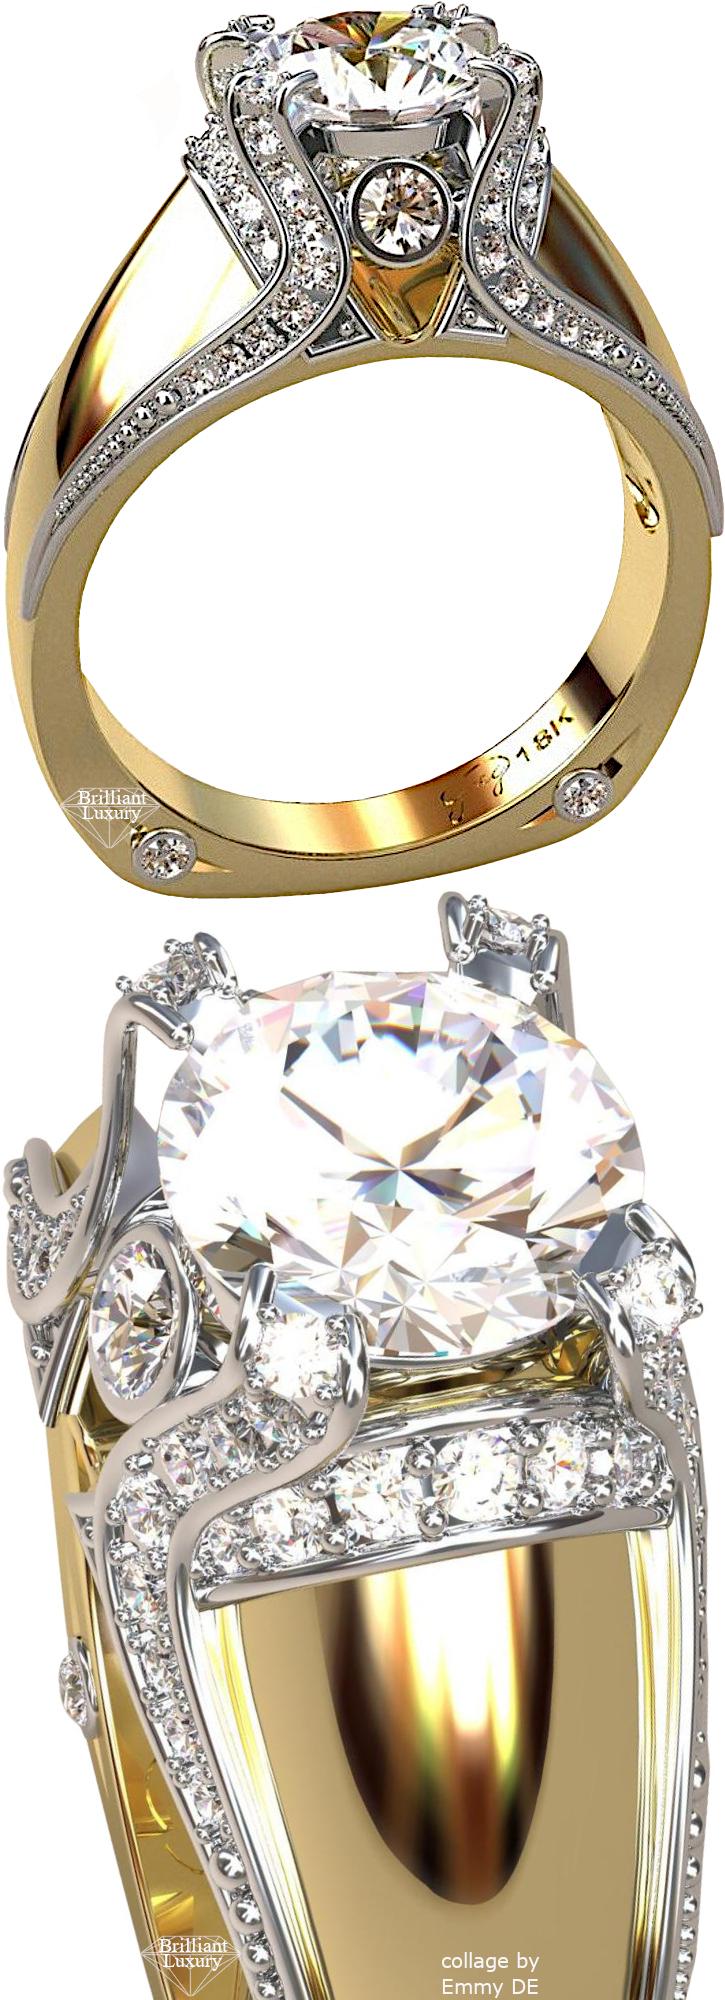 ♦Greg Neeley Italian Top Ladies Diamond 18k Bridal Ring #gregneeley #jewelry #brilliantluxury